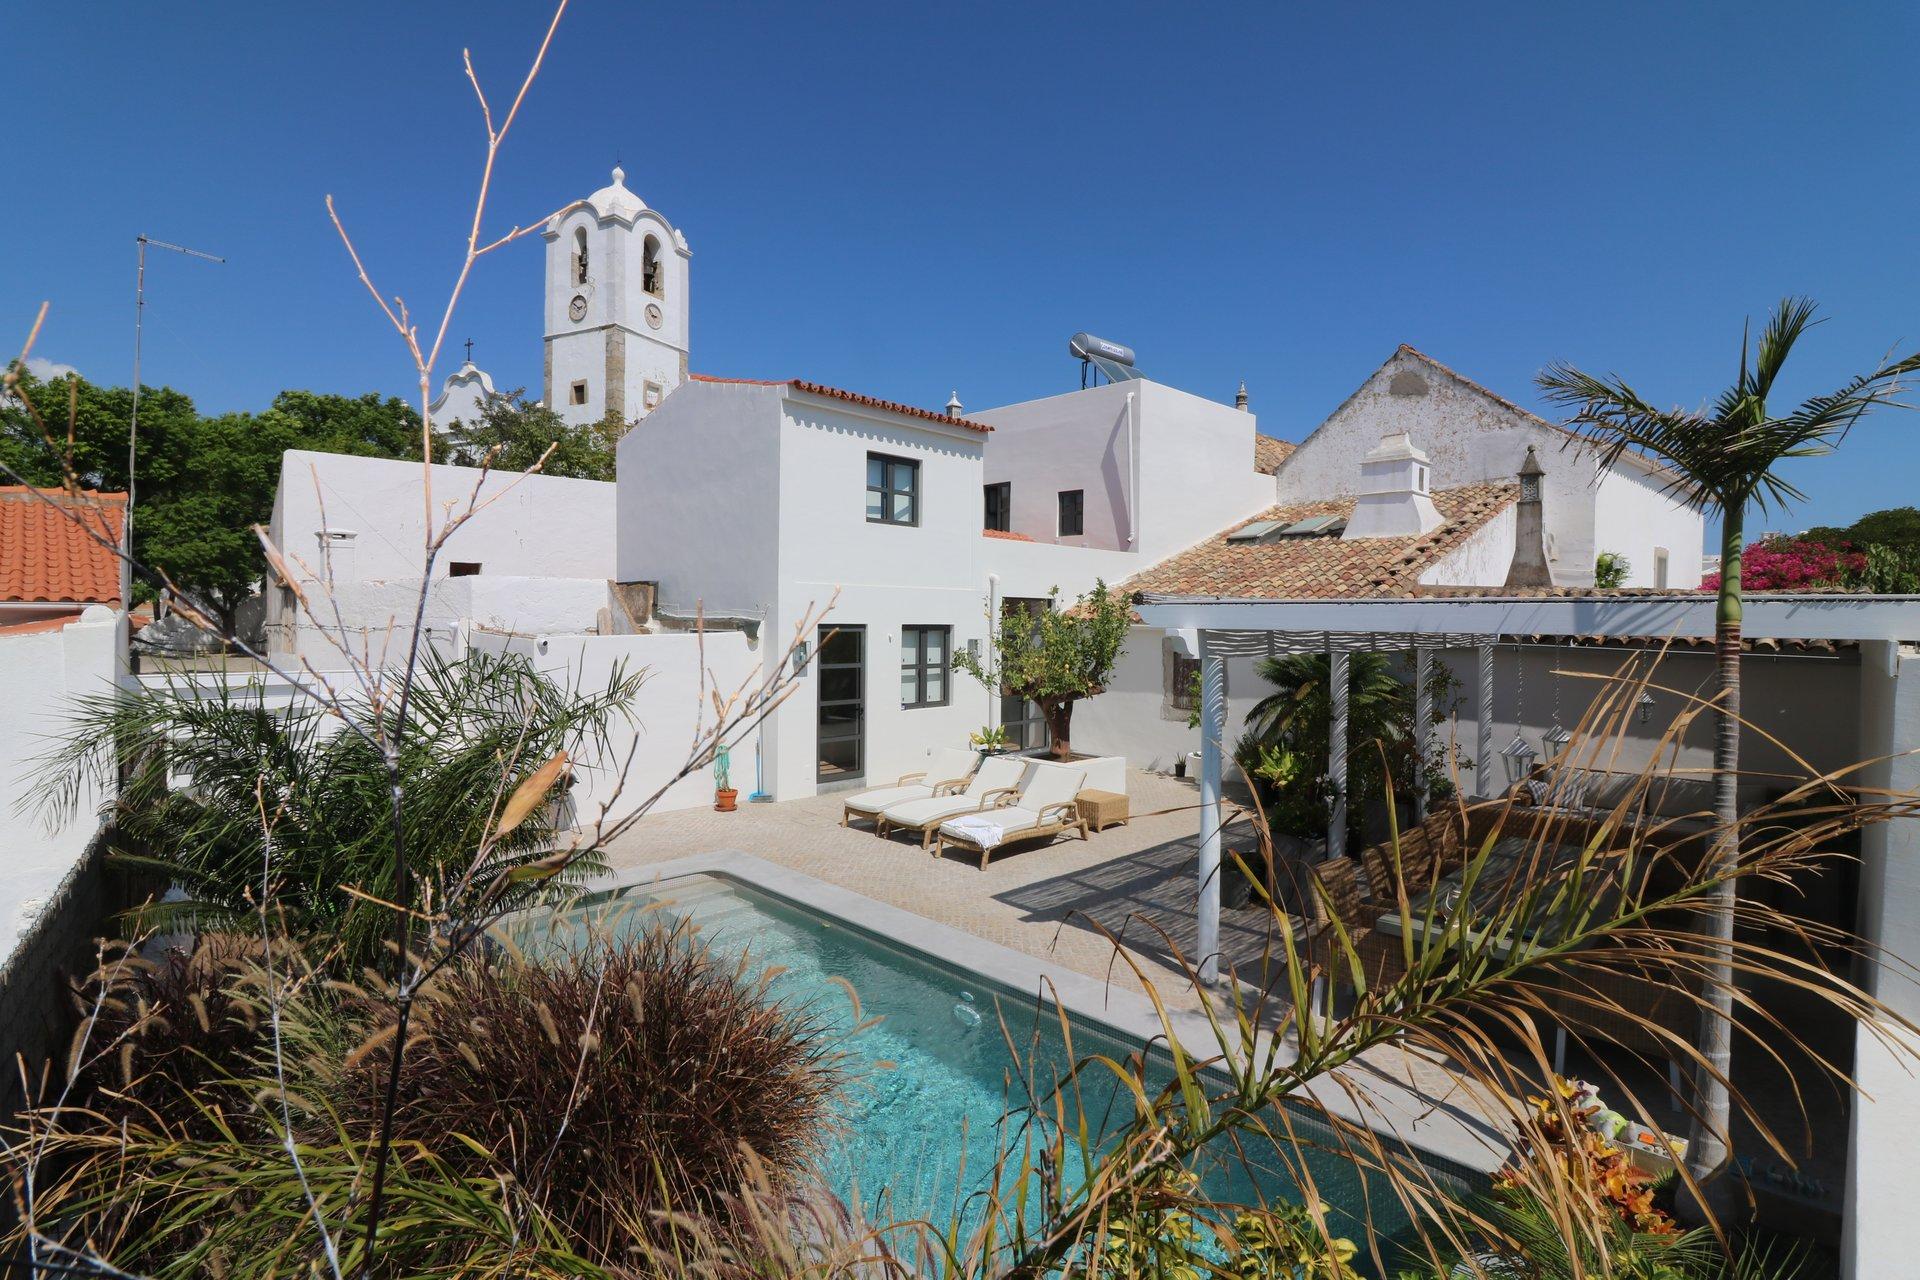 4 Bedroom Villa Santa Barbara de Nexe, Central Algarve Ref: JV10382